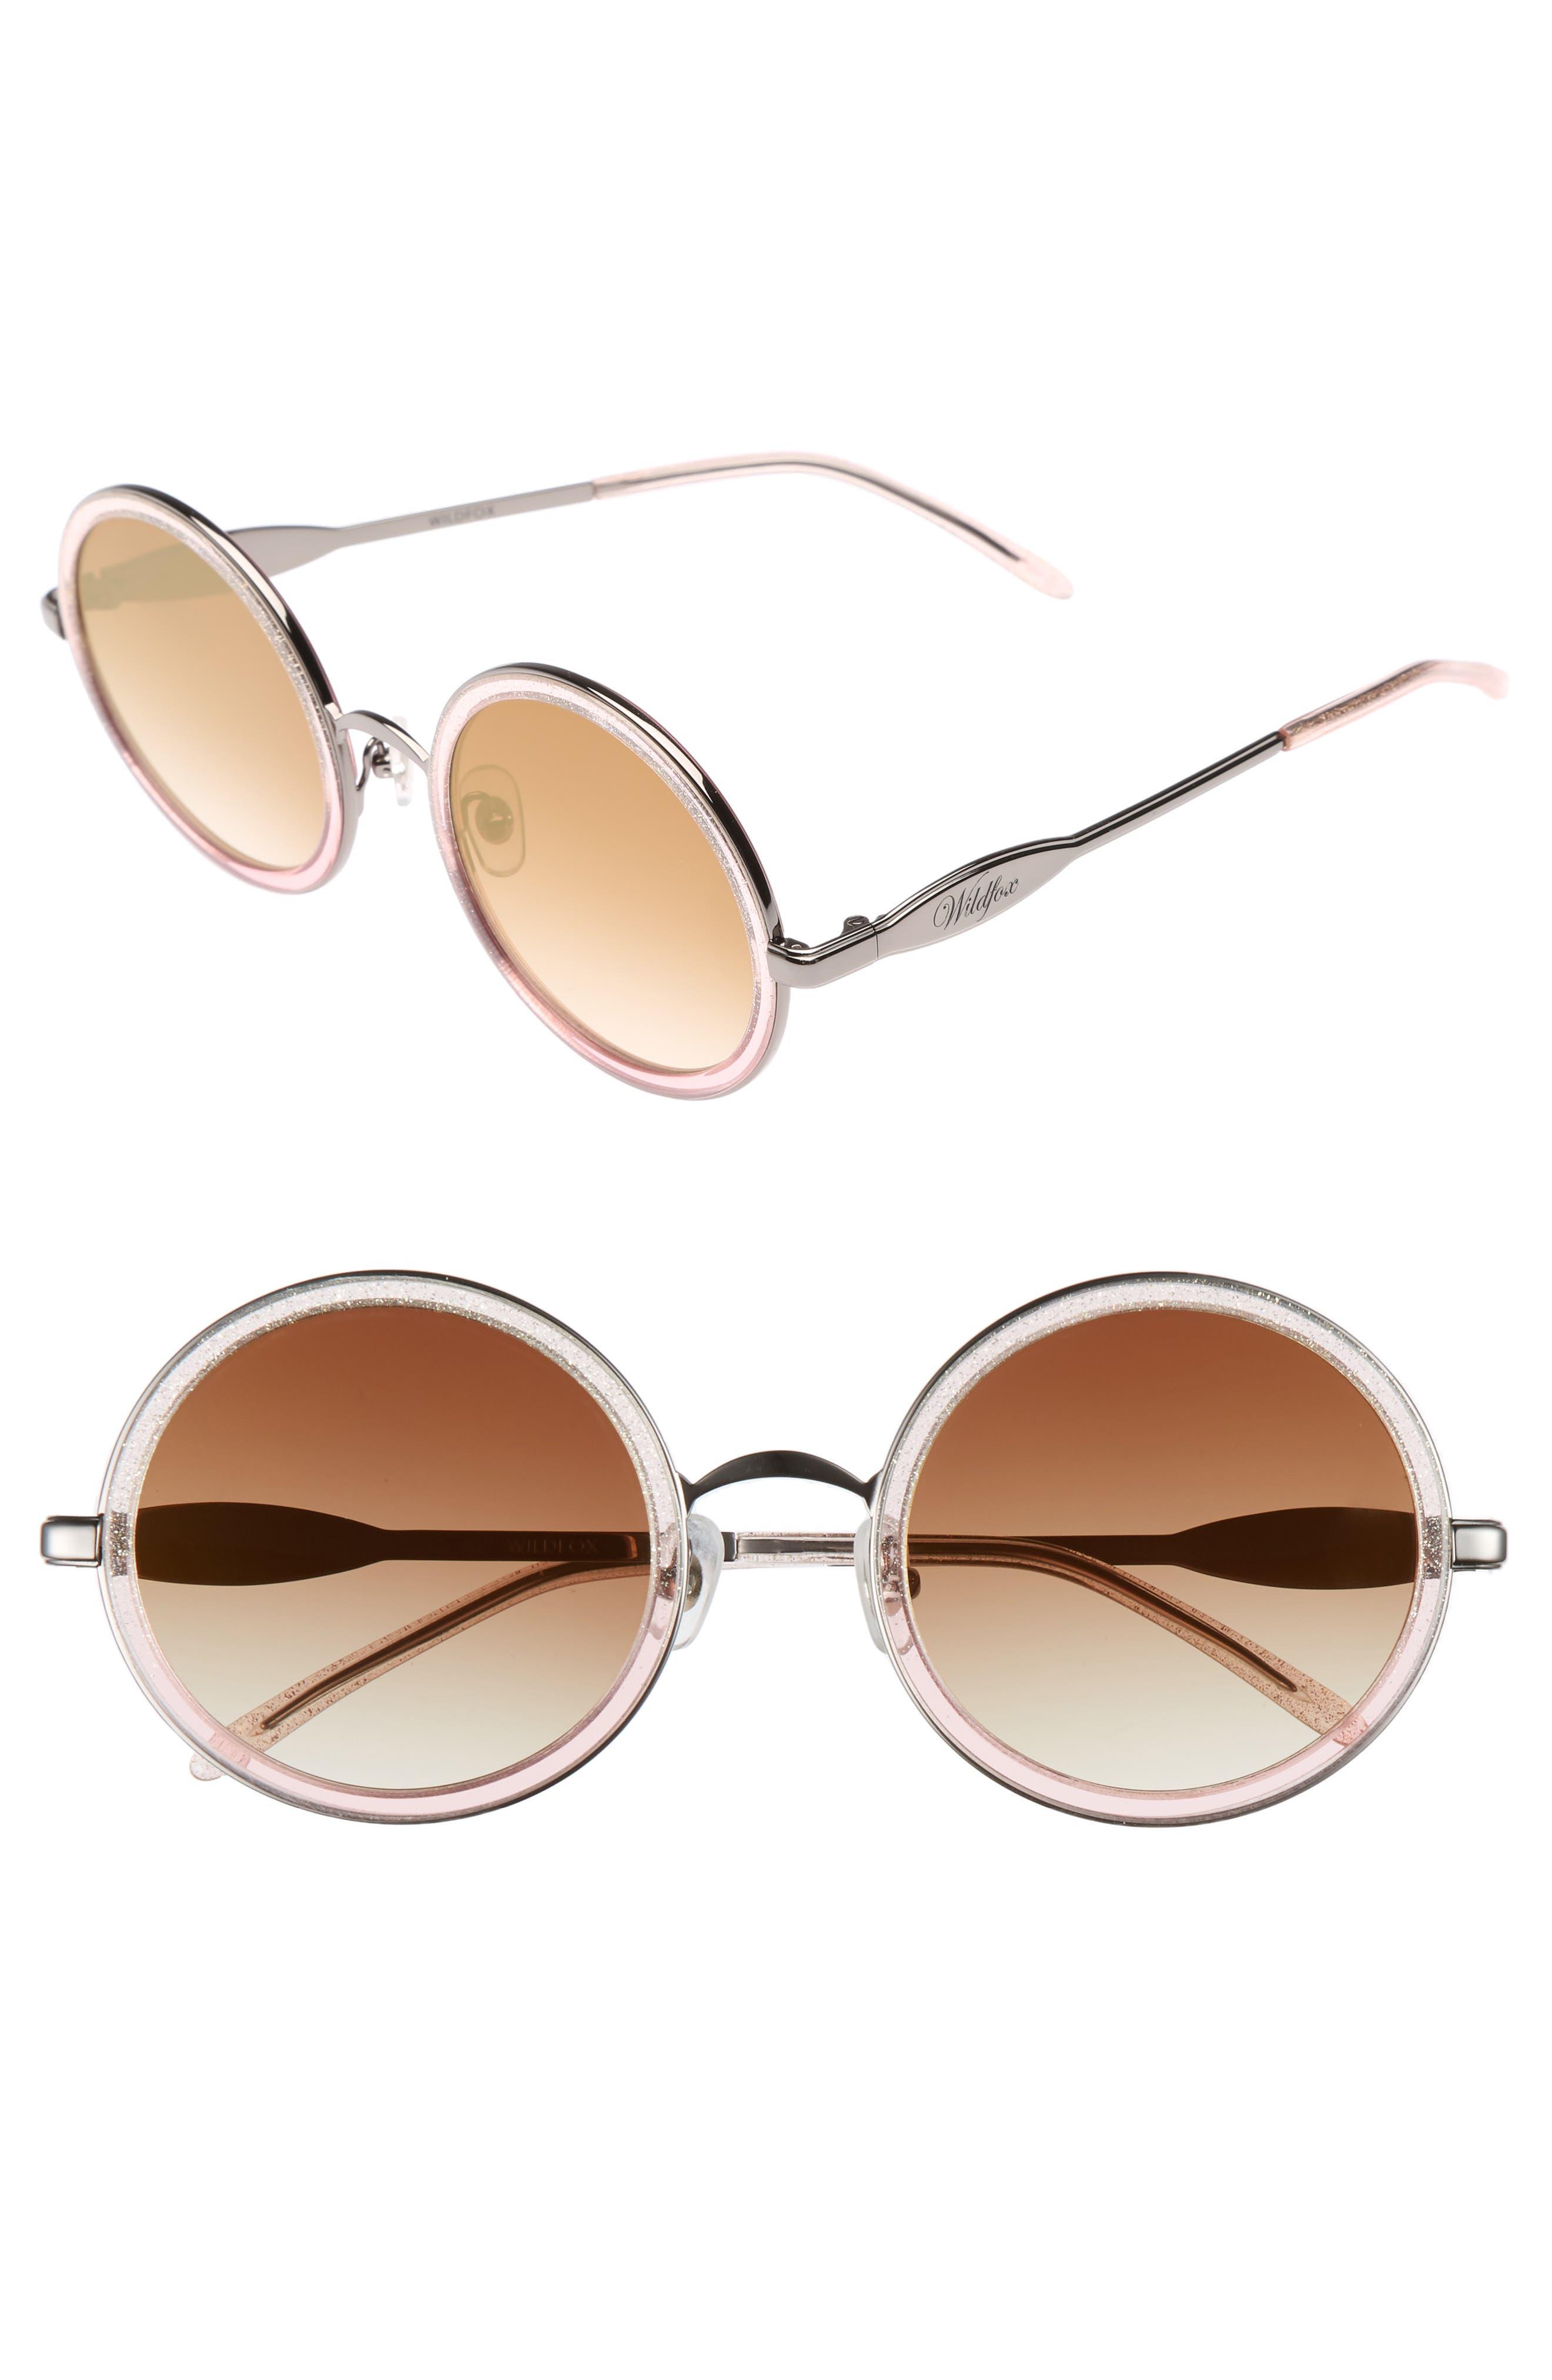 Ryder Zero 49mm Flat Round Sunglasses,                             Main thumbnail 1, color,                             GLITZ